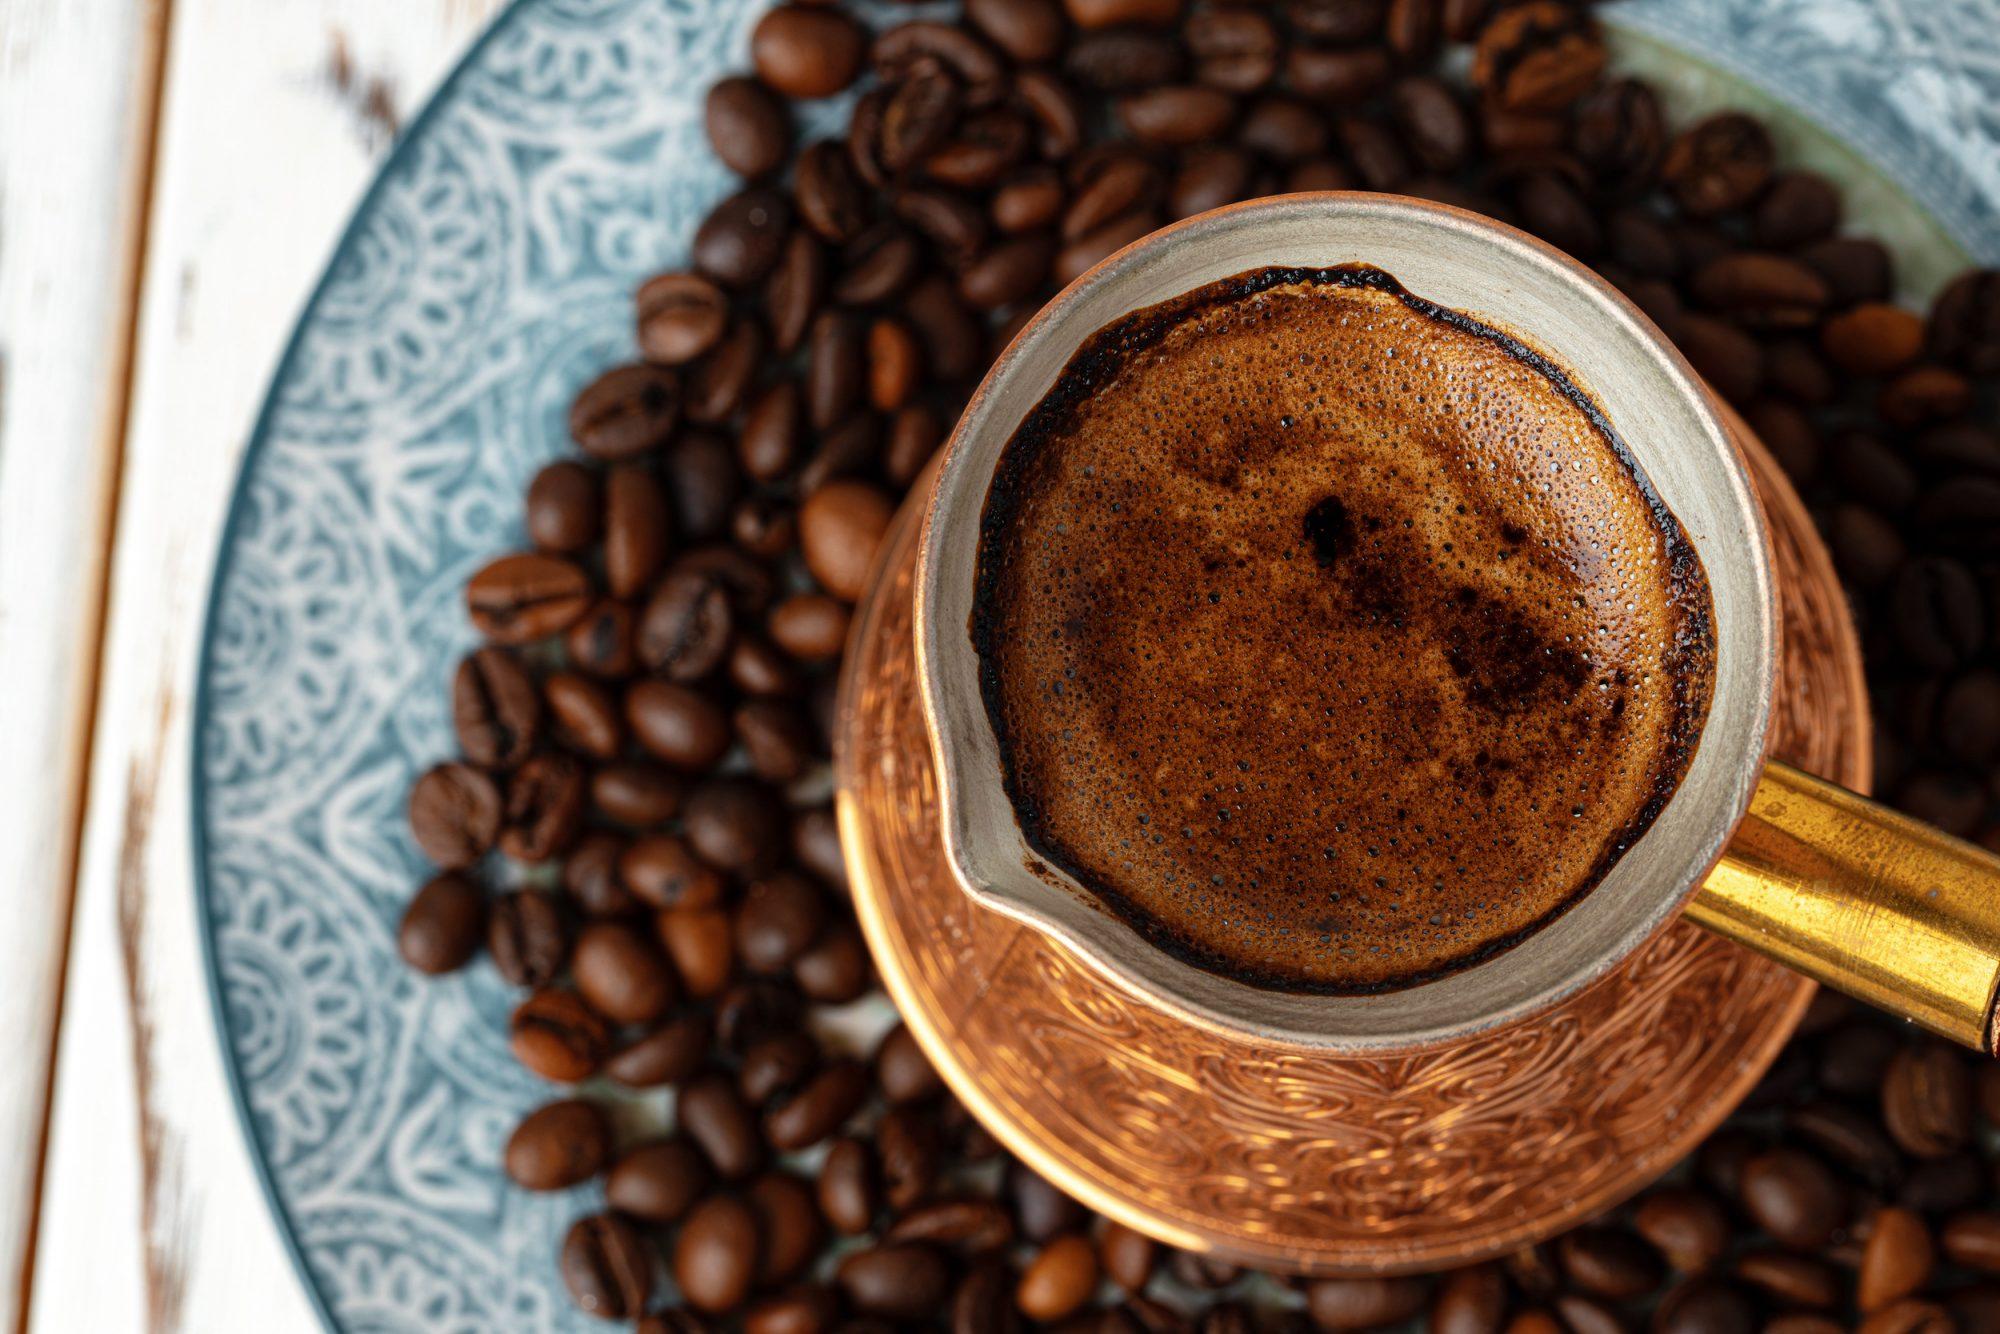 Drinking coffee reduces risk of contracting coronavirus: Study